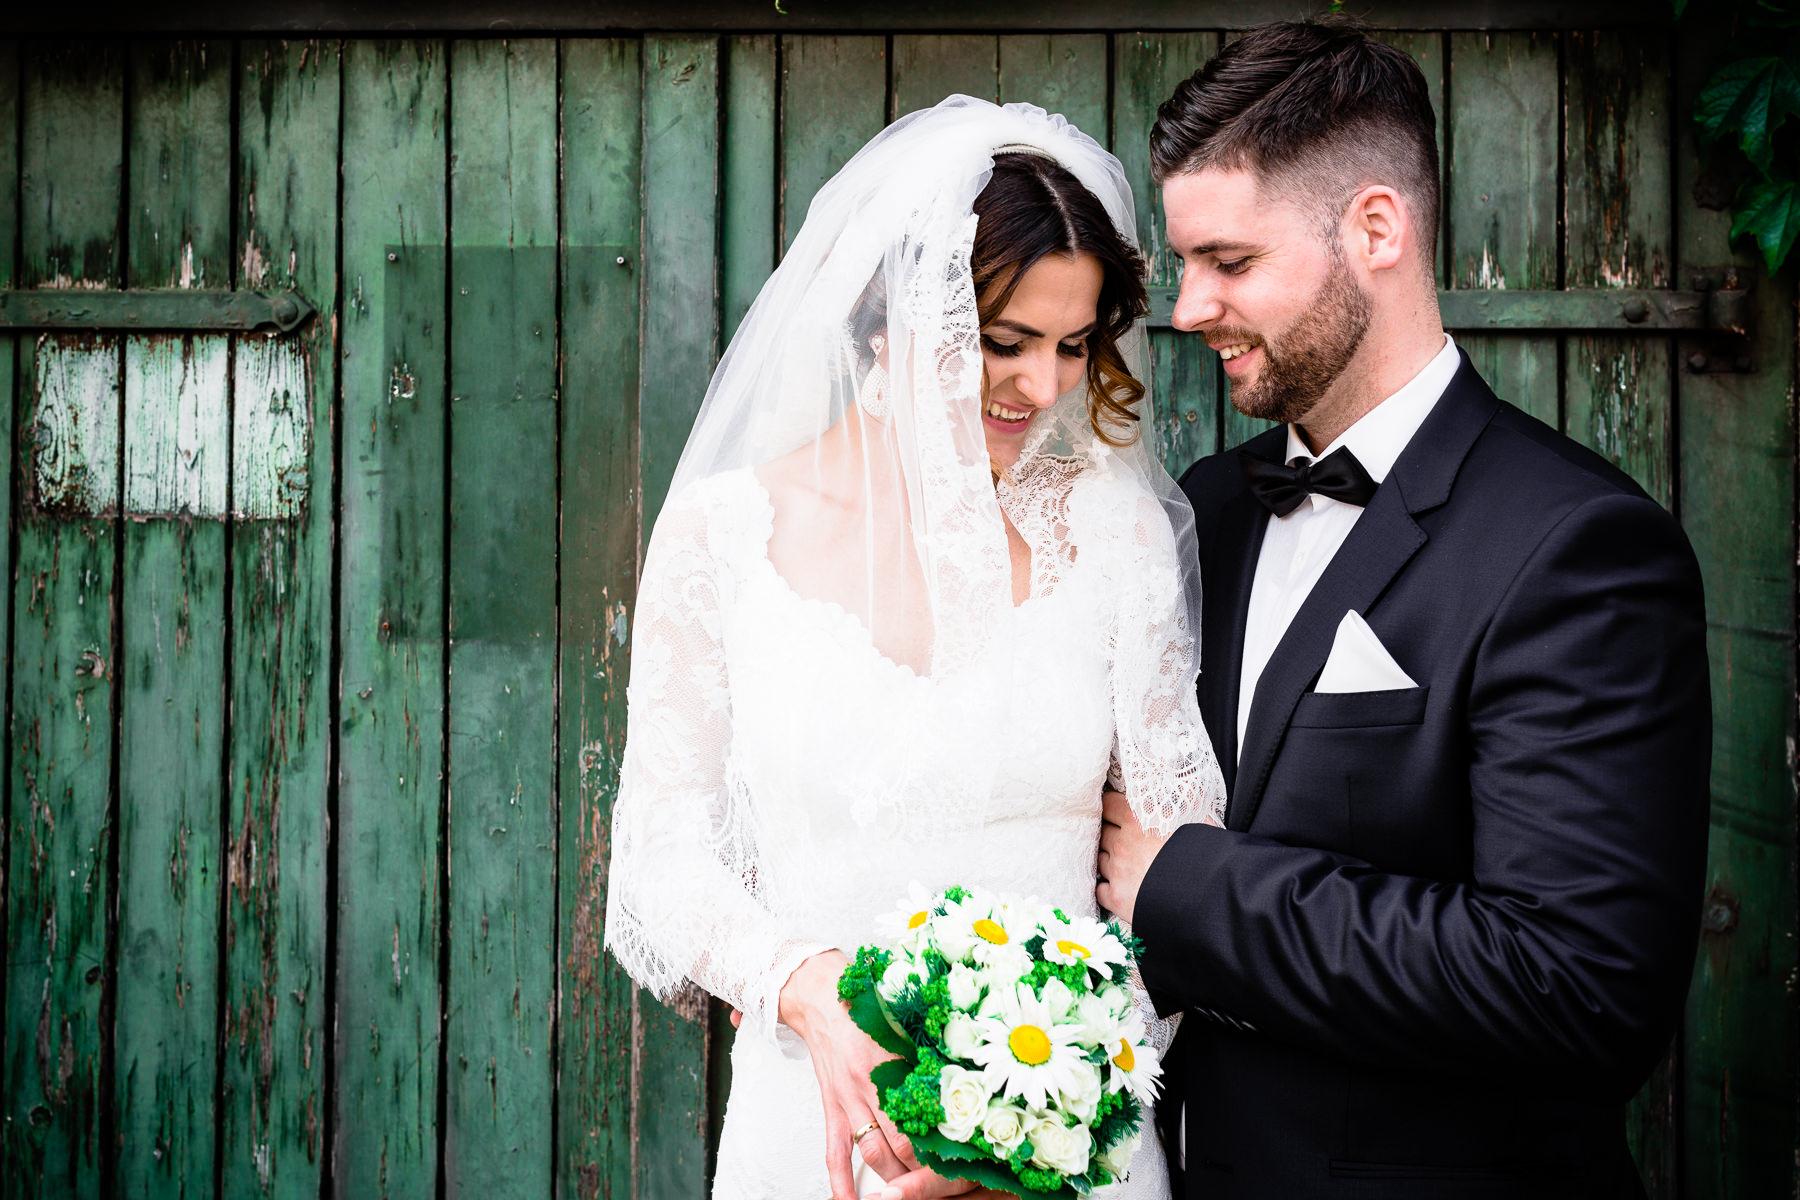 White-Wedding-Photography-Marina-und-Lukas-Web-72dpi-232